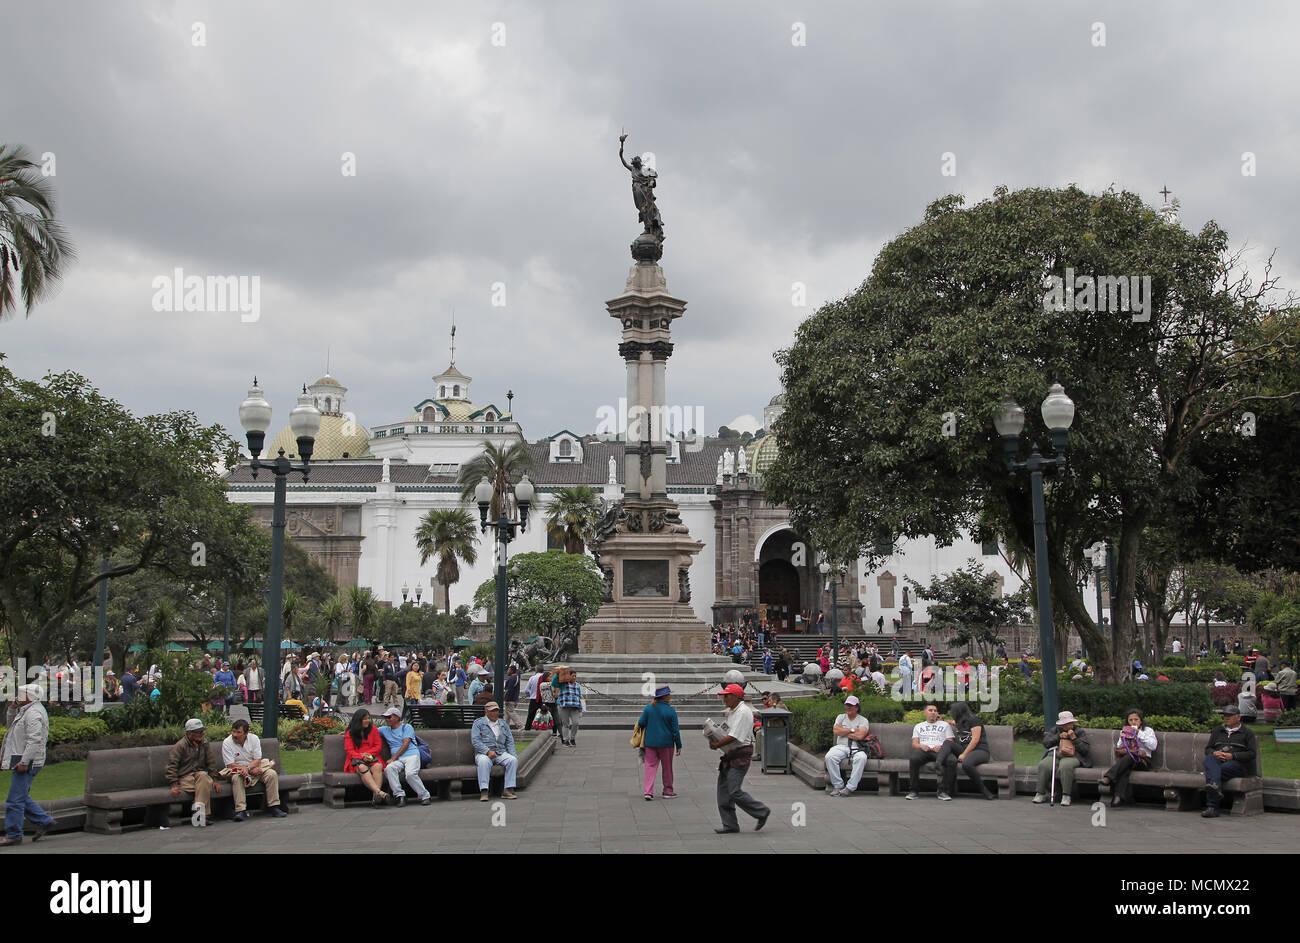 Plaza Grande Quito Ecuador - Stock Image